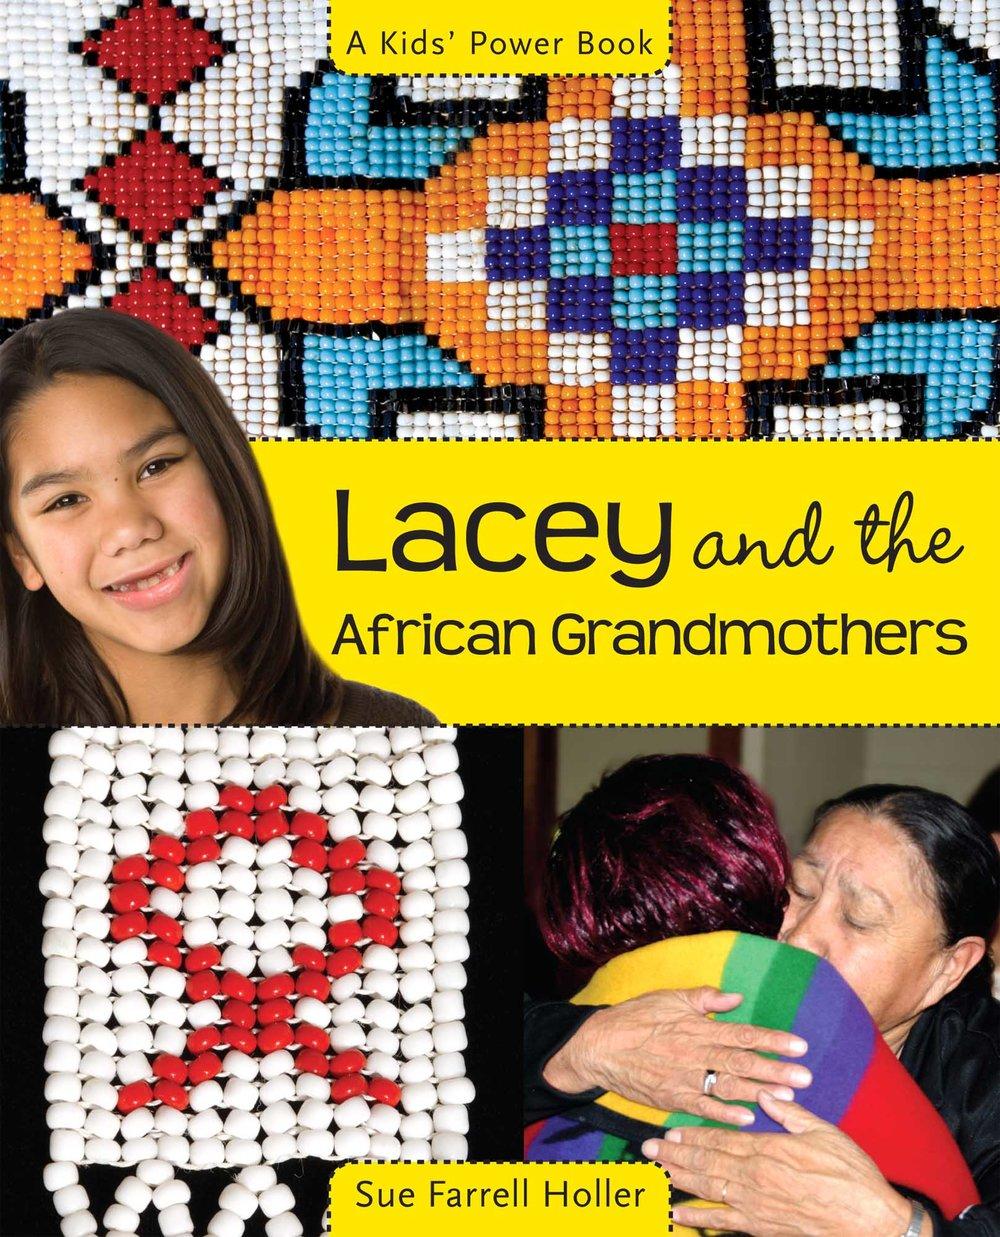 LaceyandtheAfricanGrandmothers